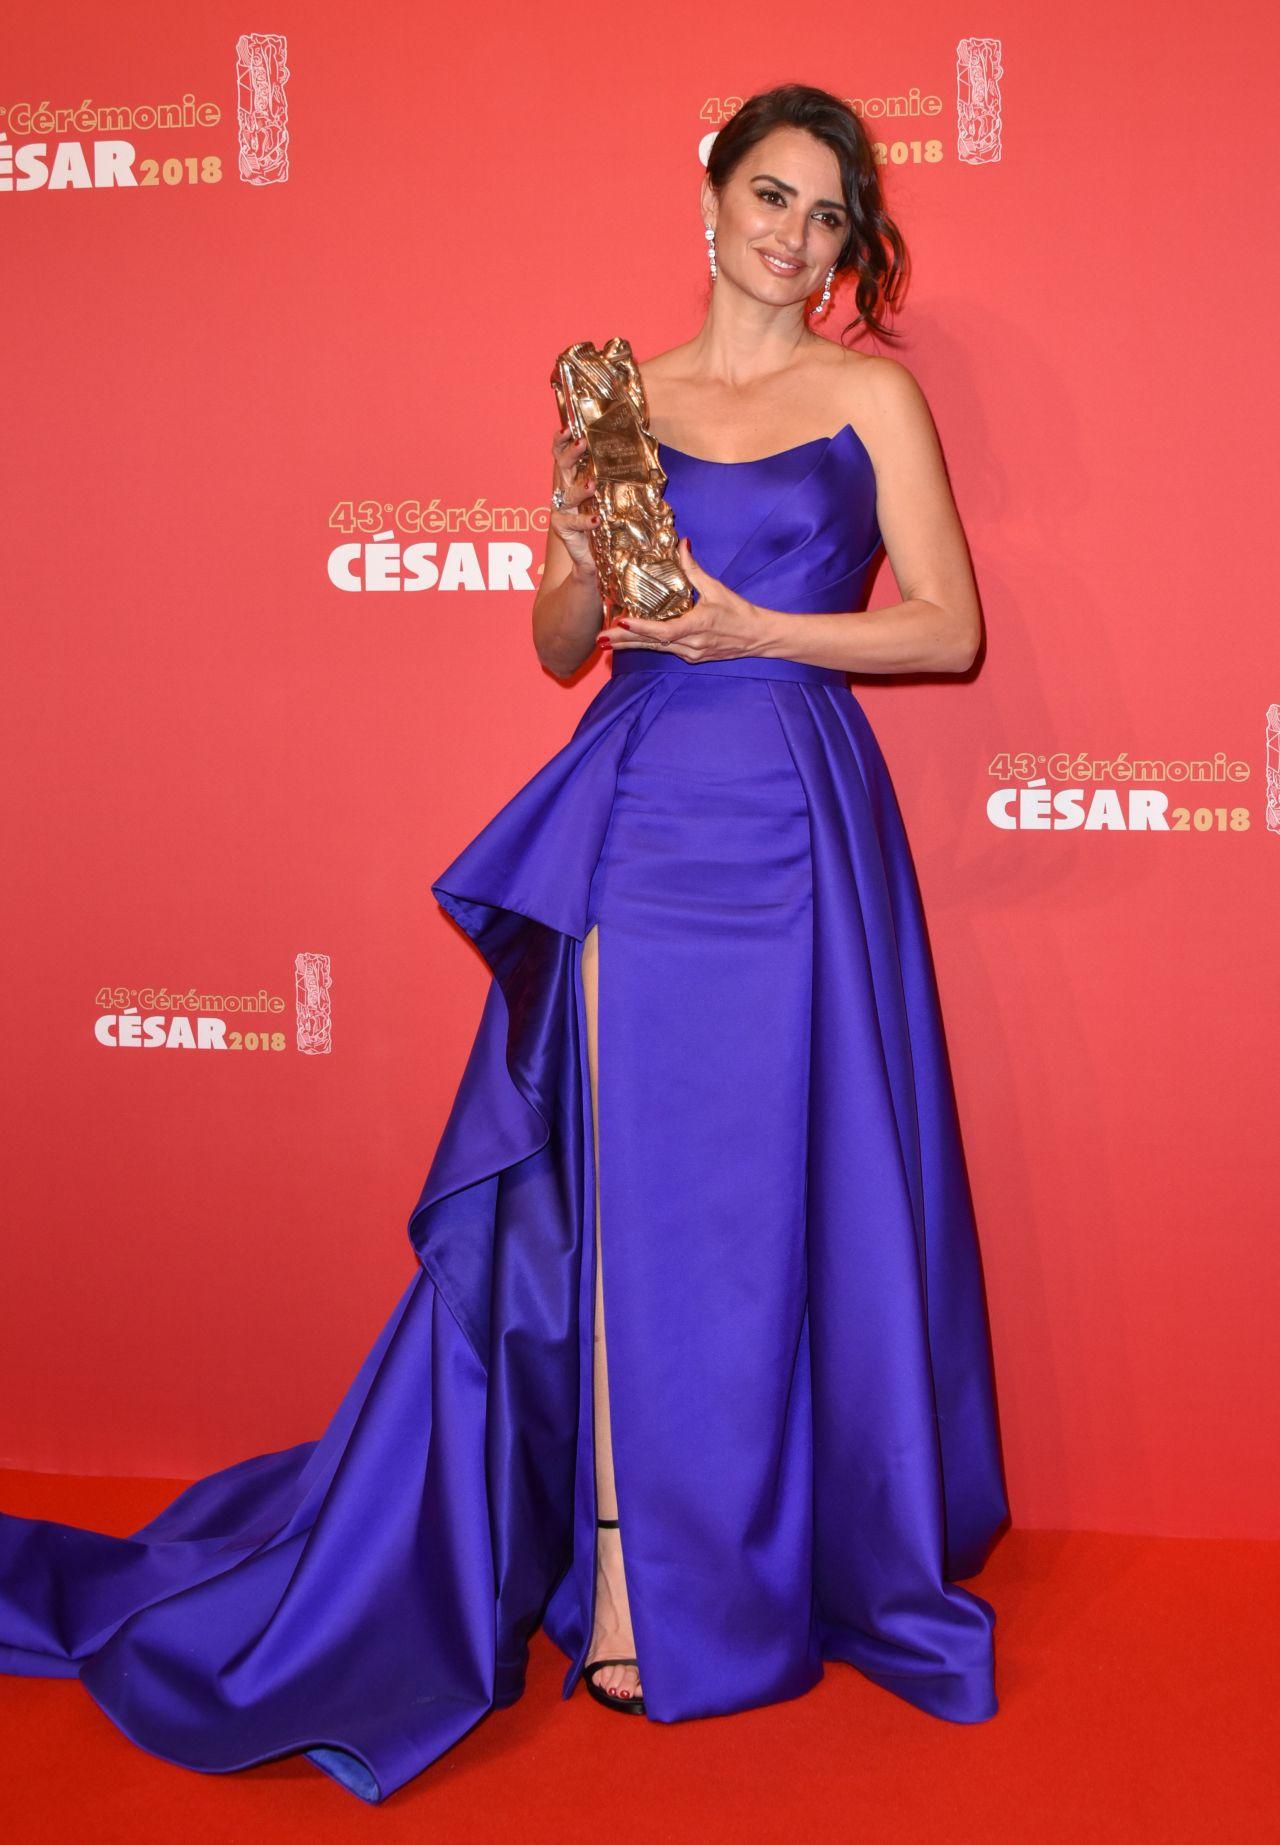 http://celebmafia.com/wp-content/uploads/2018/03/penelope-cruz-cesar-film-awards-2018-in-paris-8.jpg